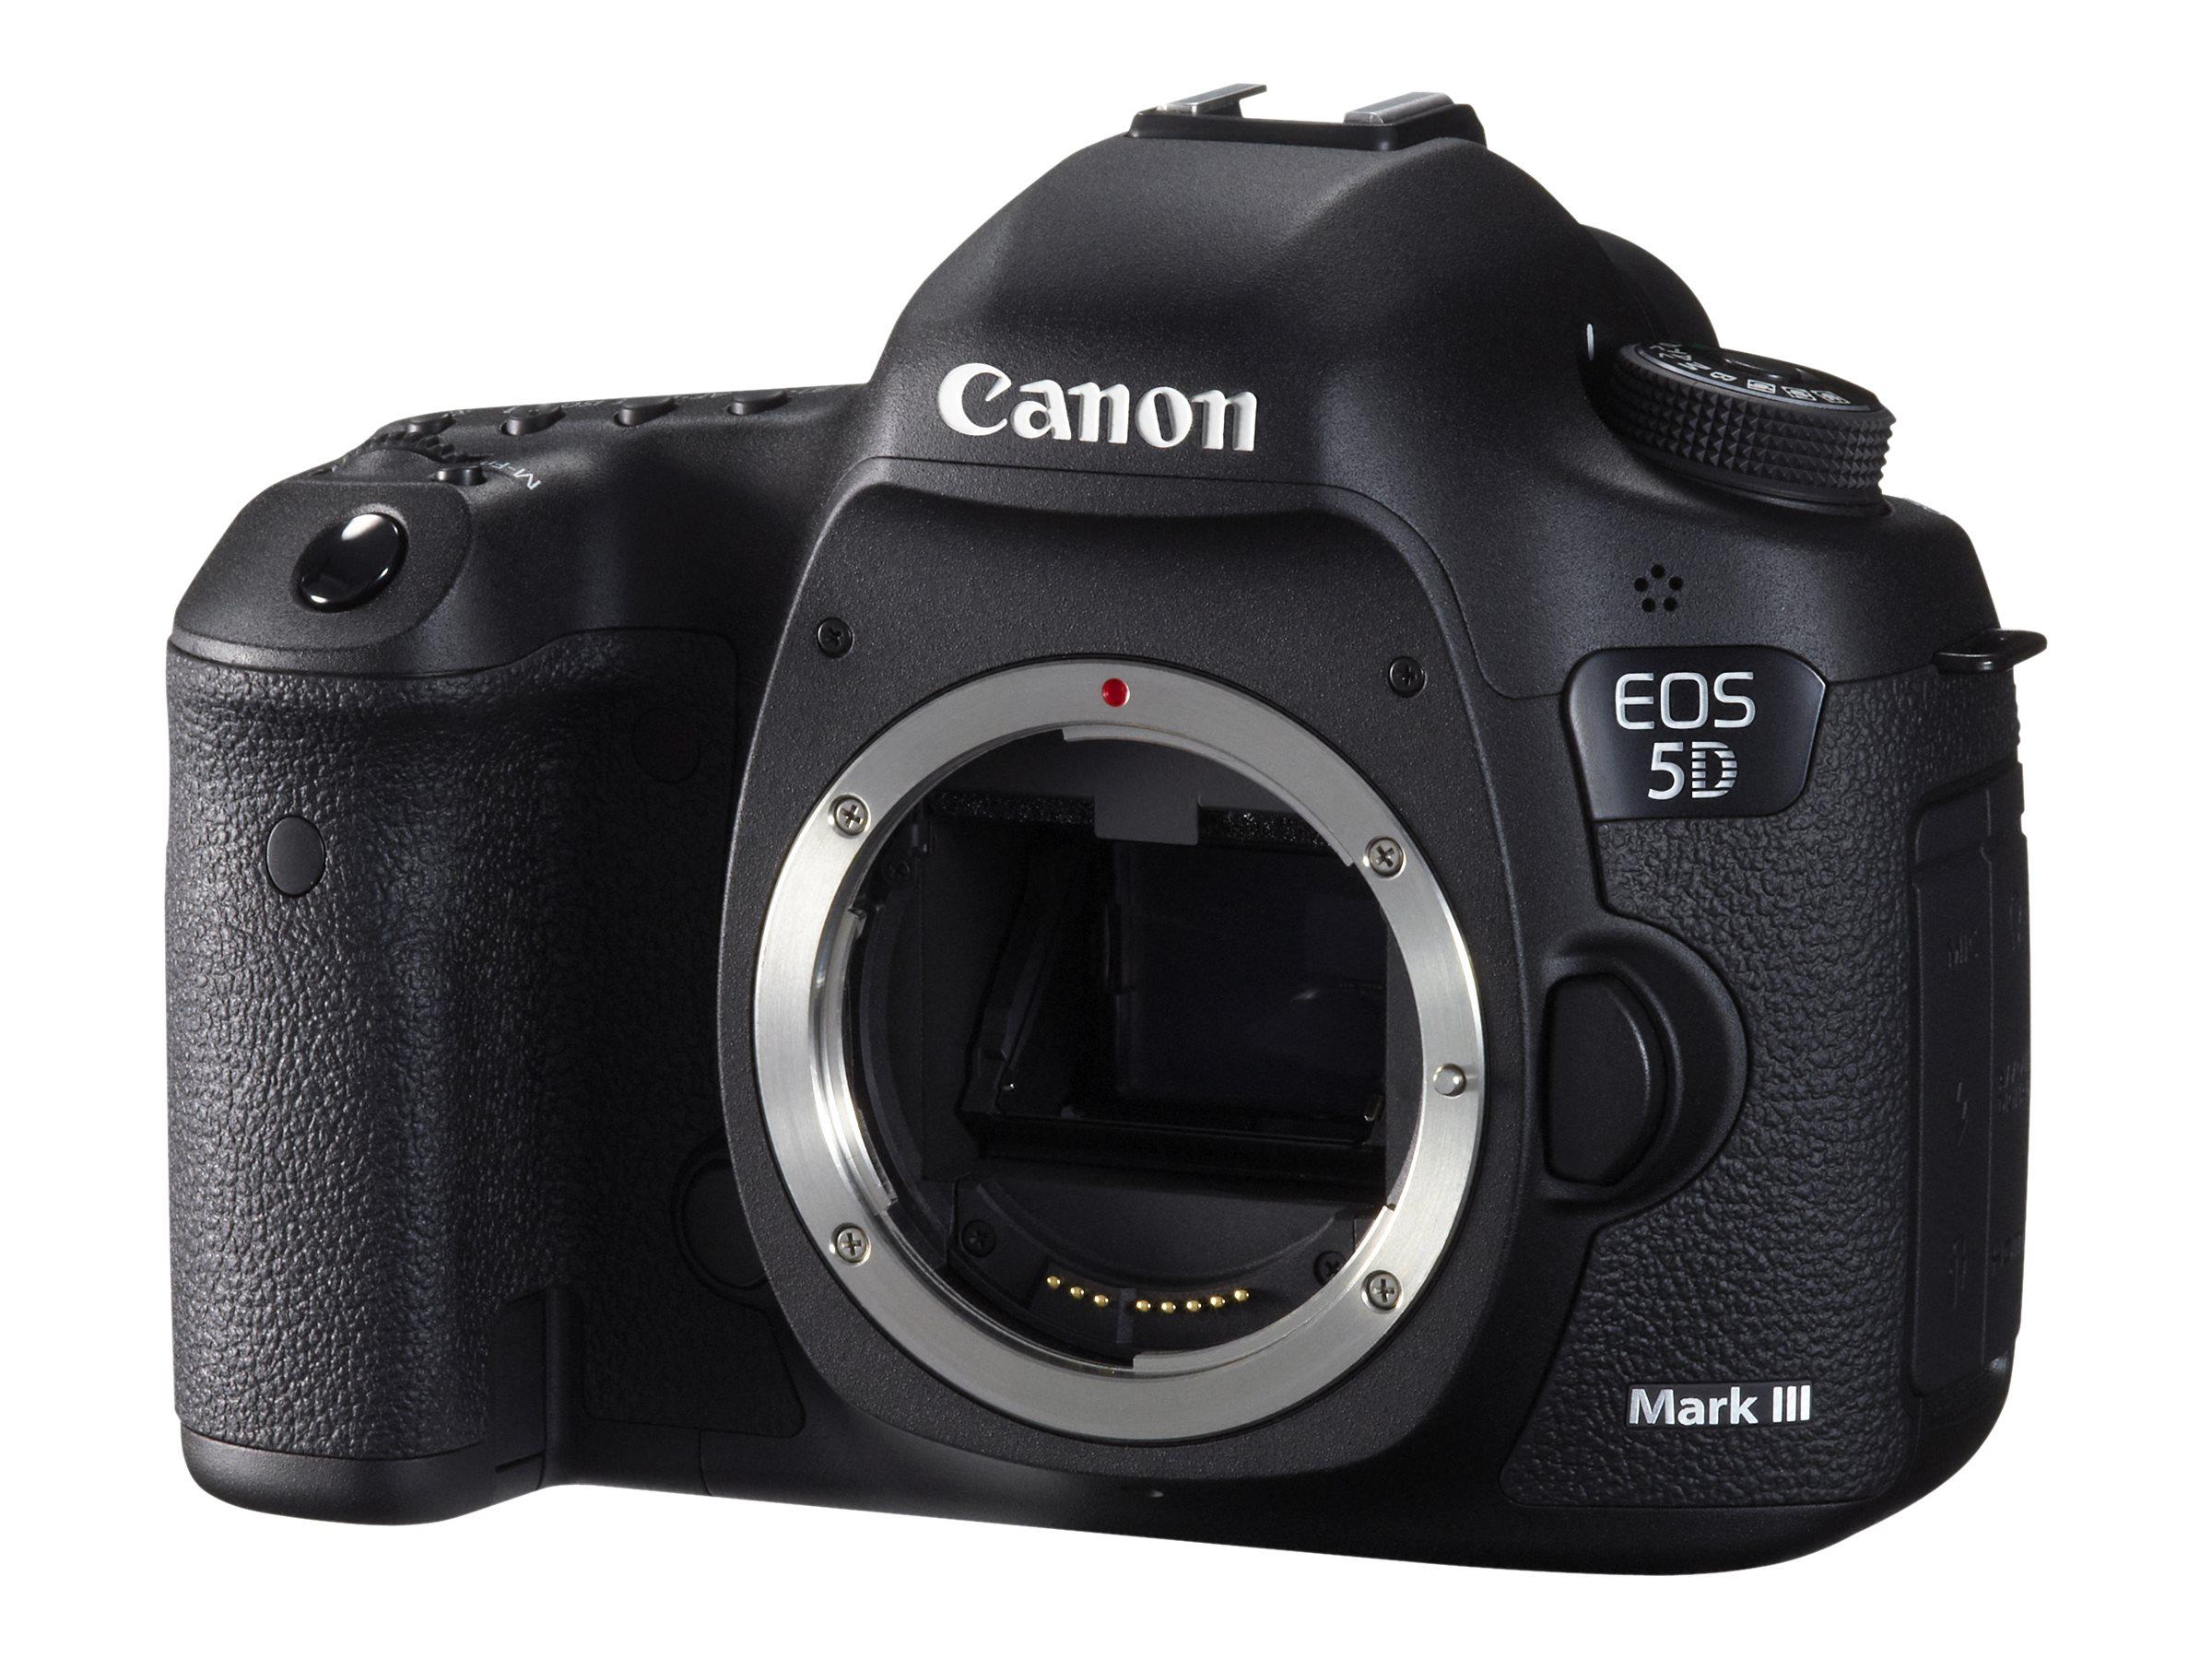 Canon EOS 5D Mark III Digital Camera (Body Only), 5260B002, 13769441, Cameras - Digital - SLR